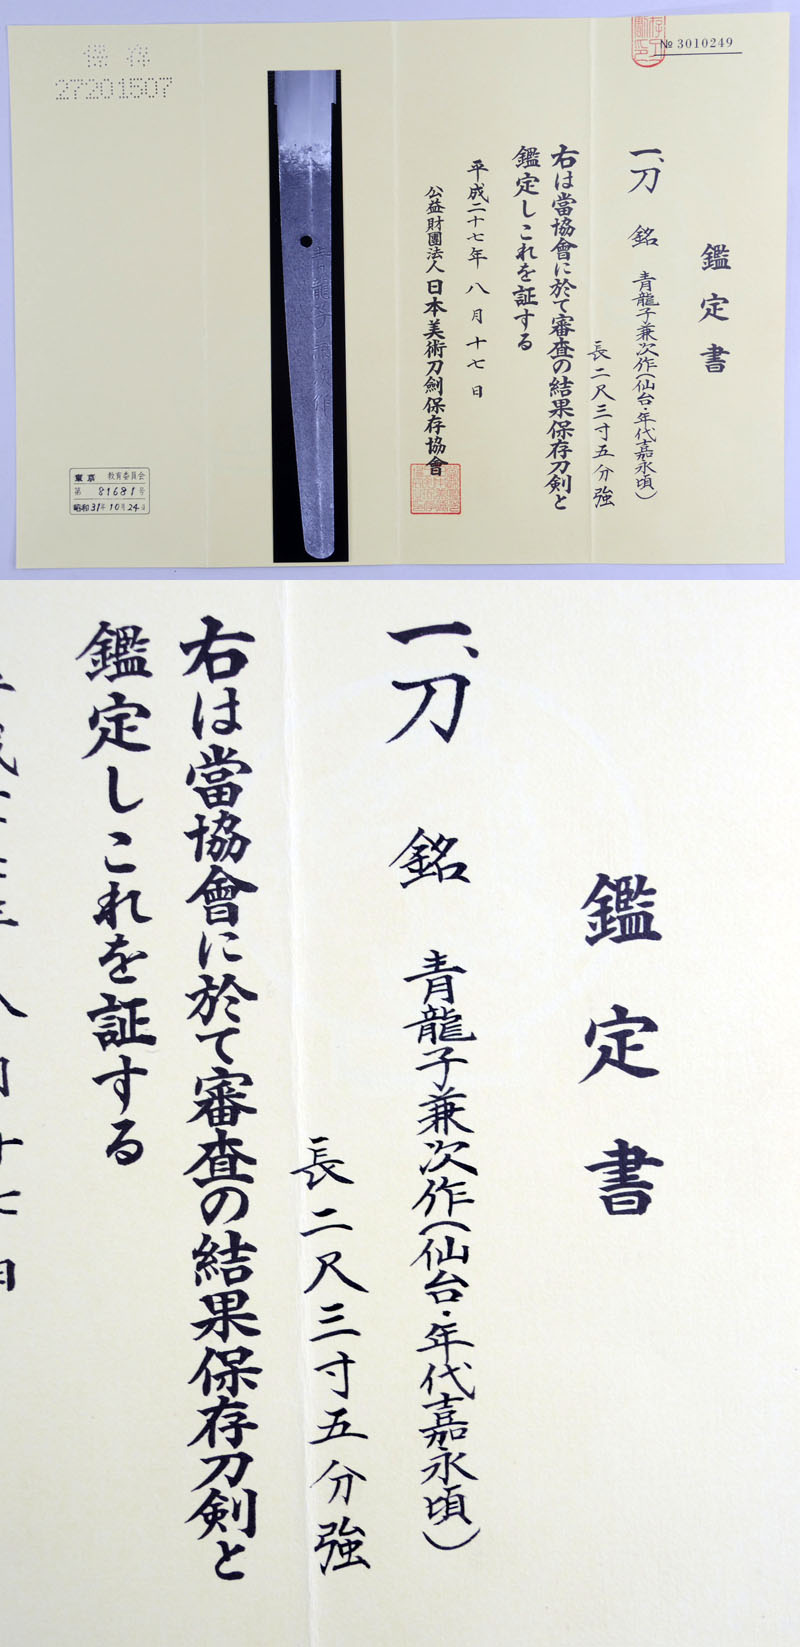 青龍子兼次作 Picture of Certificate